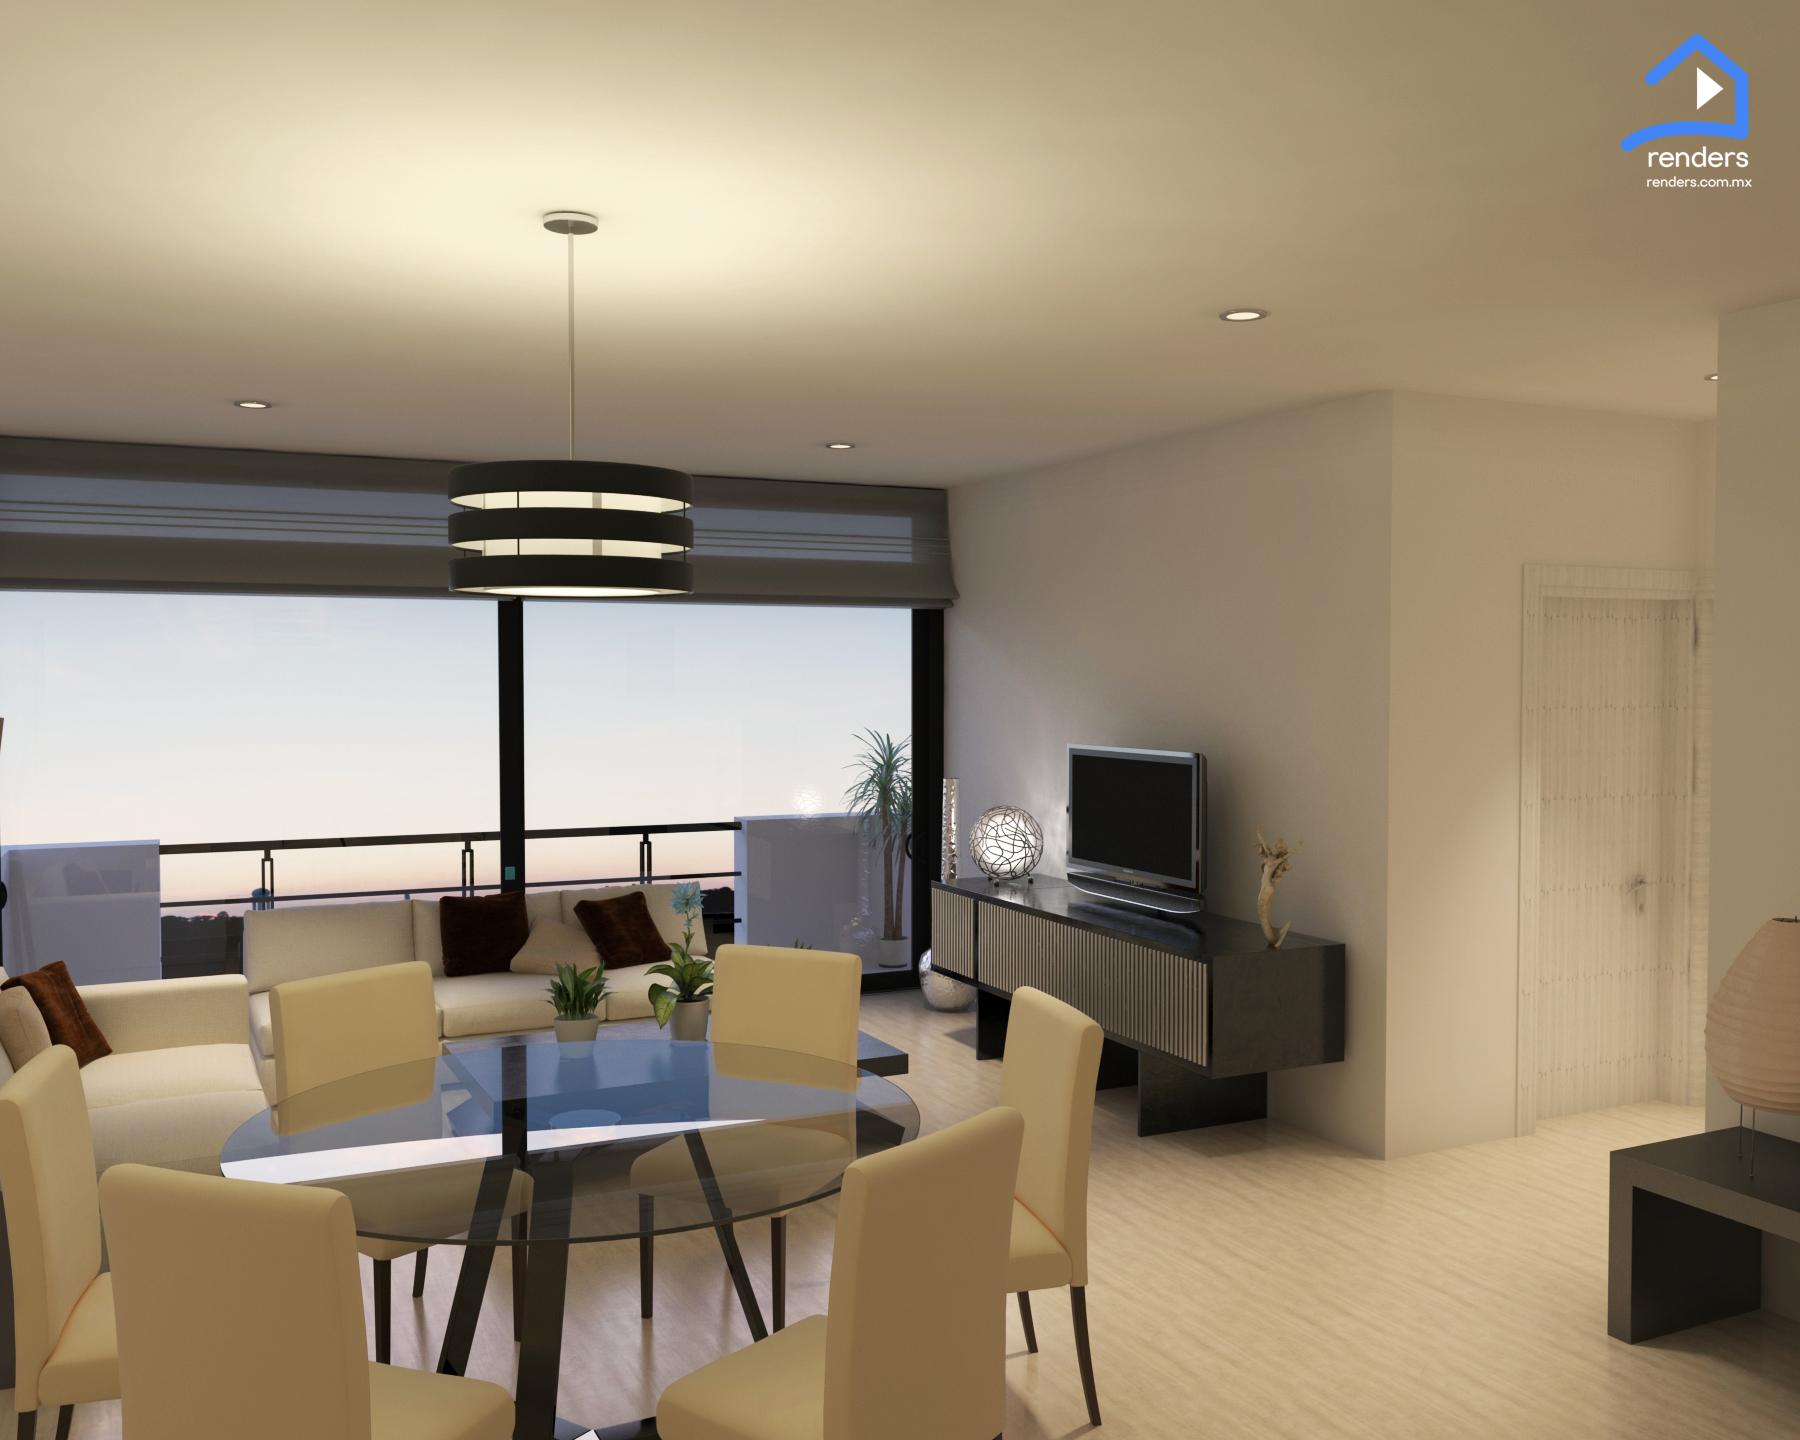 Render interior departemento arquitectura render for Departamento interior